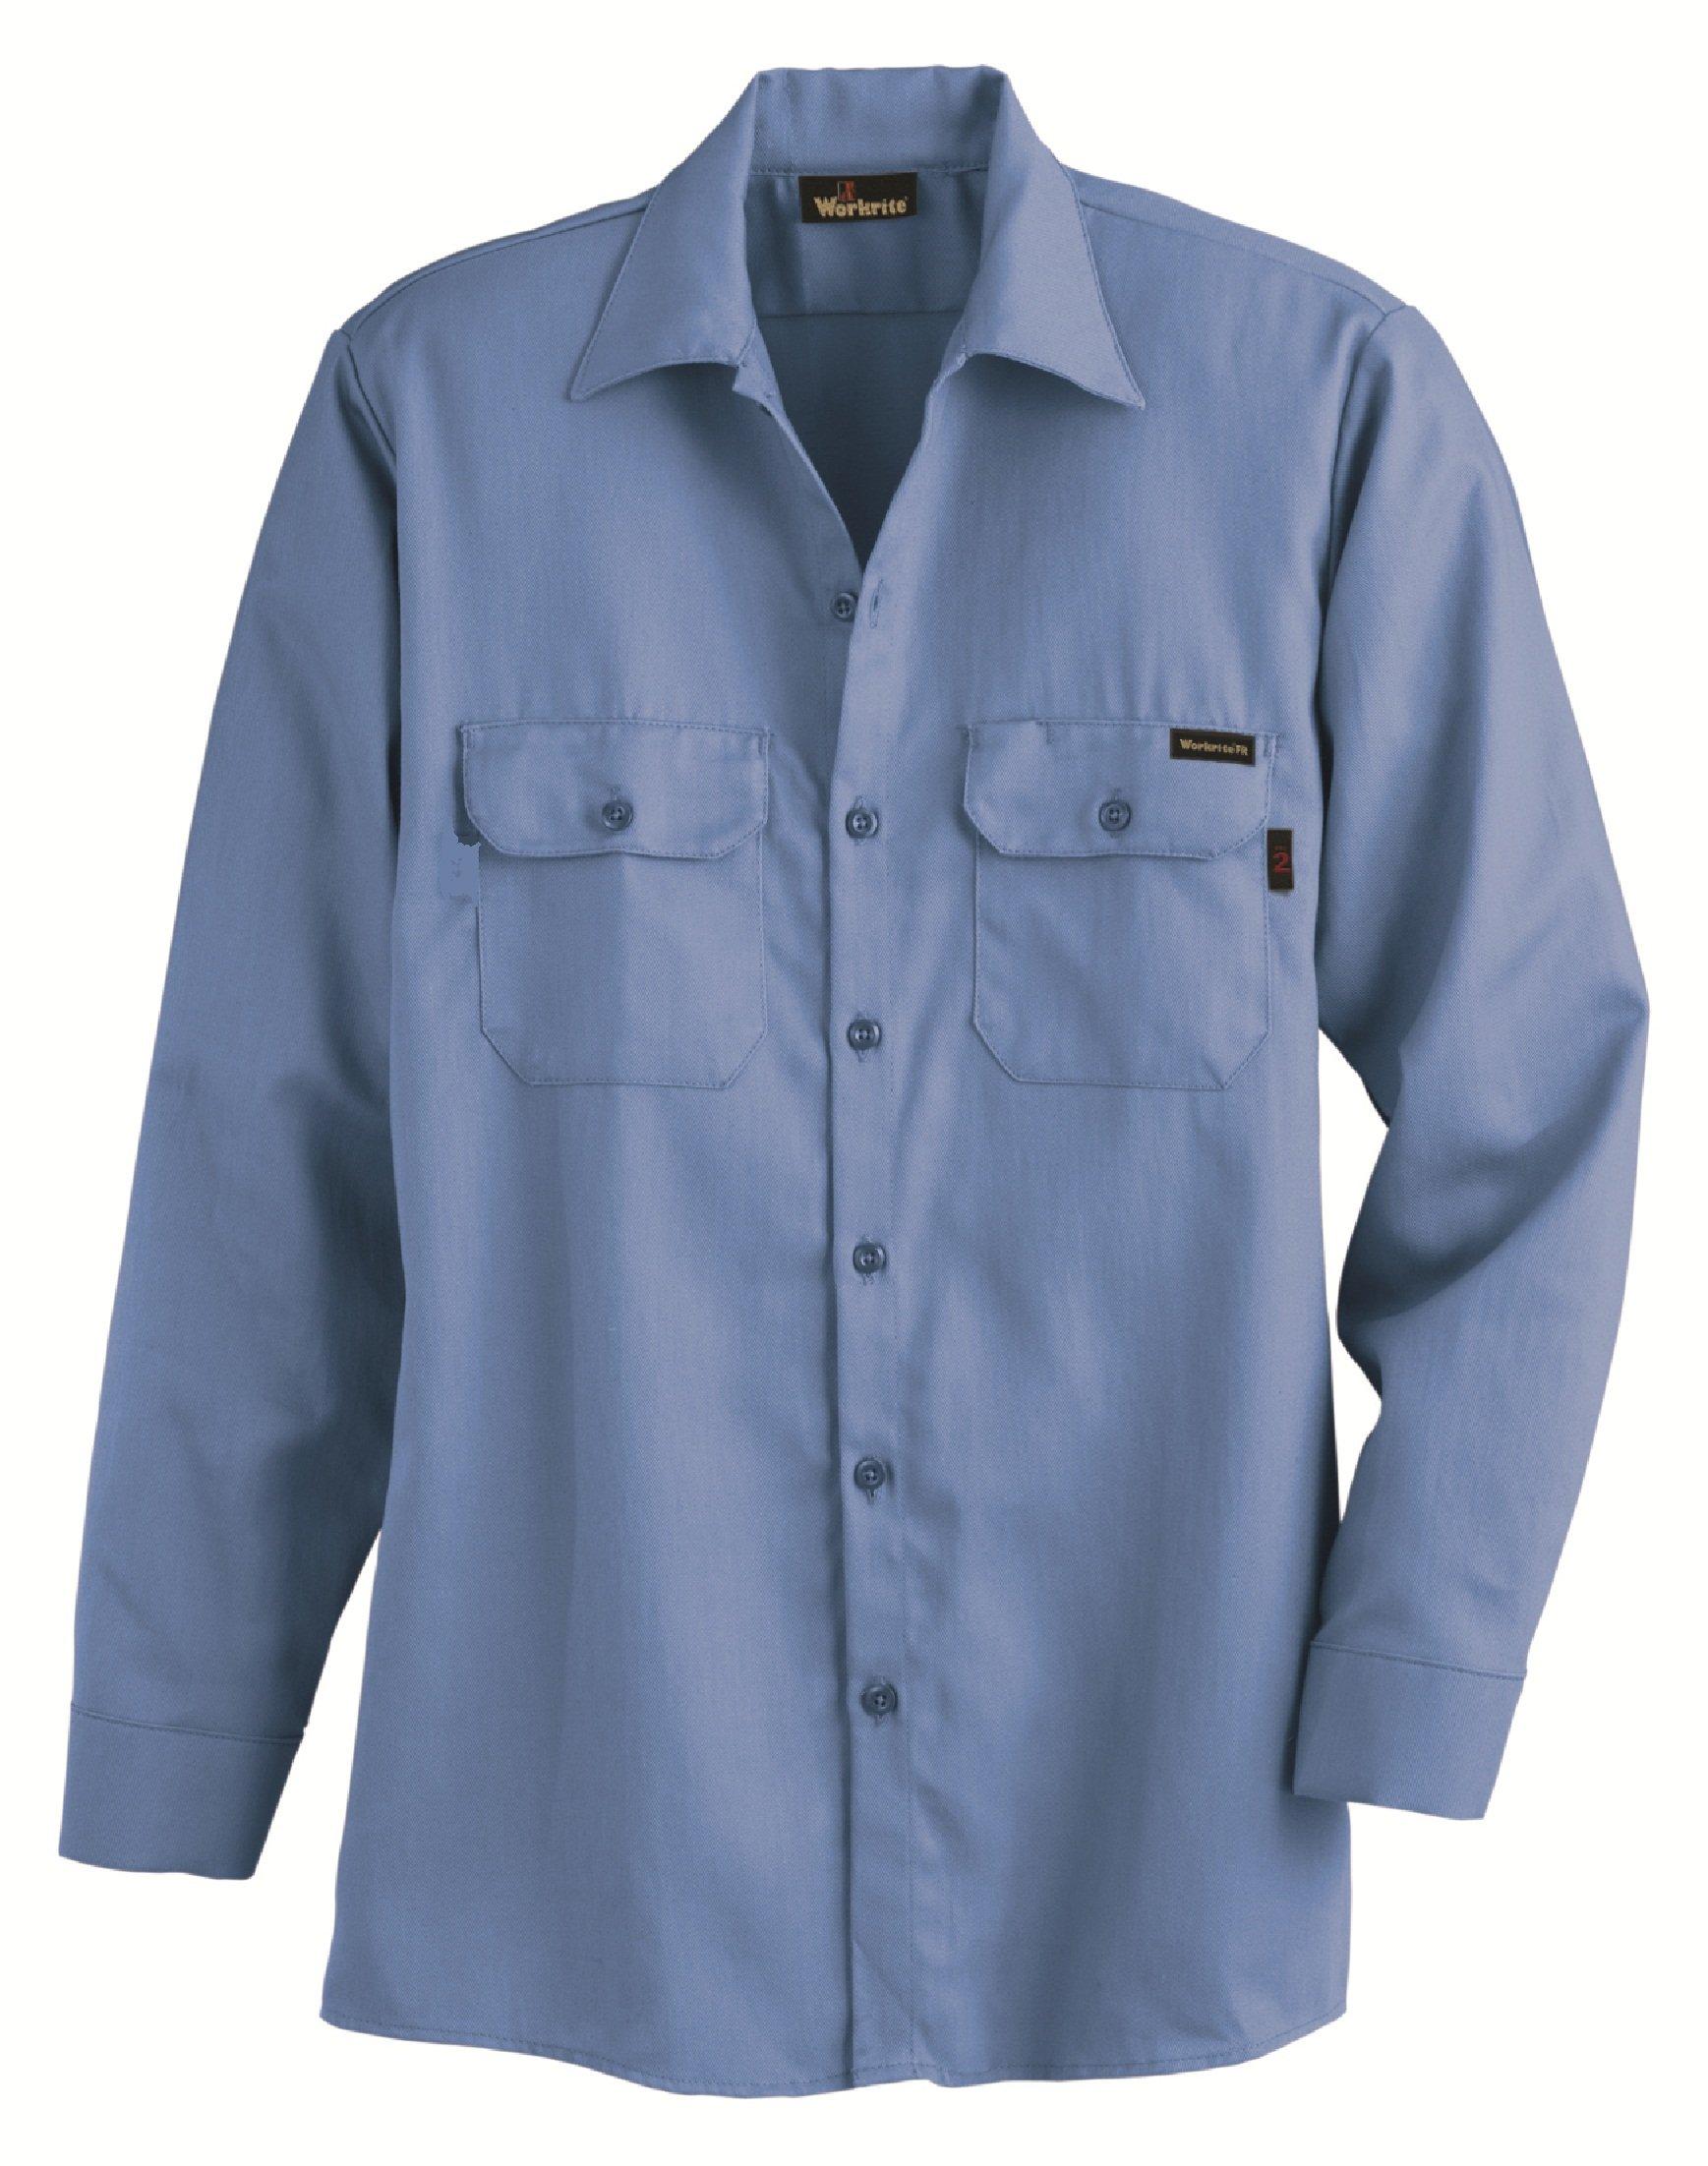 Workrite 231ID70MBXL-0R Flame Resistant 7 oz Indura Long Sleeve Work Shirt, Button Cuff, X-Large, Regular Length, Medium Blue